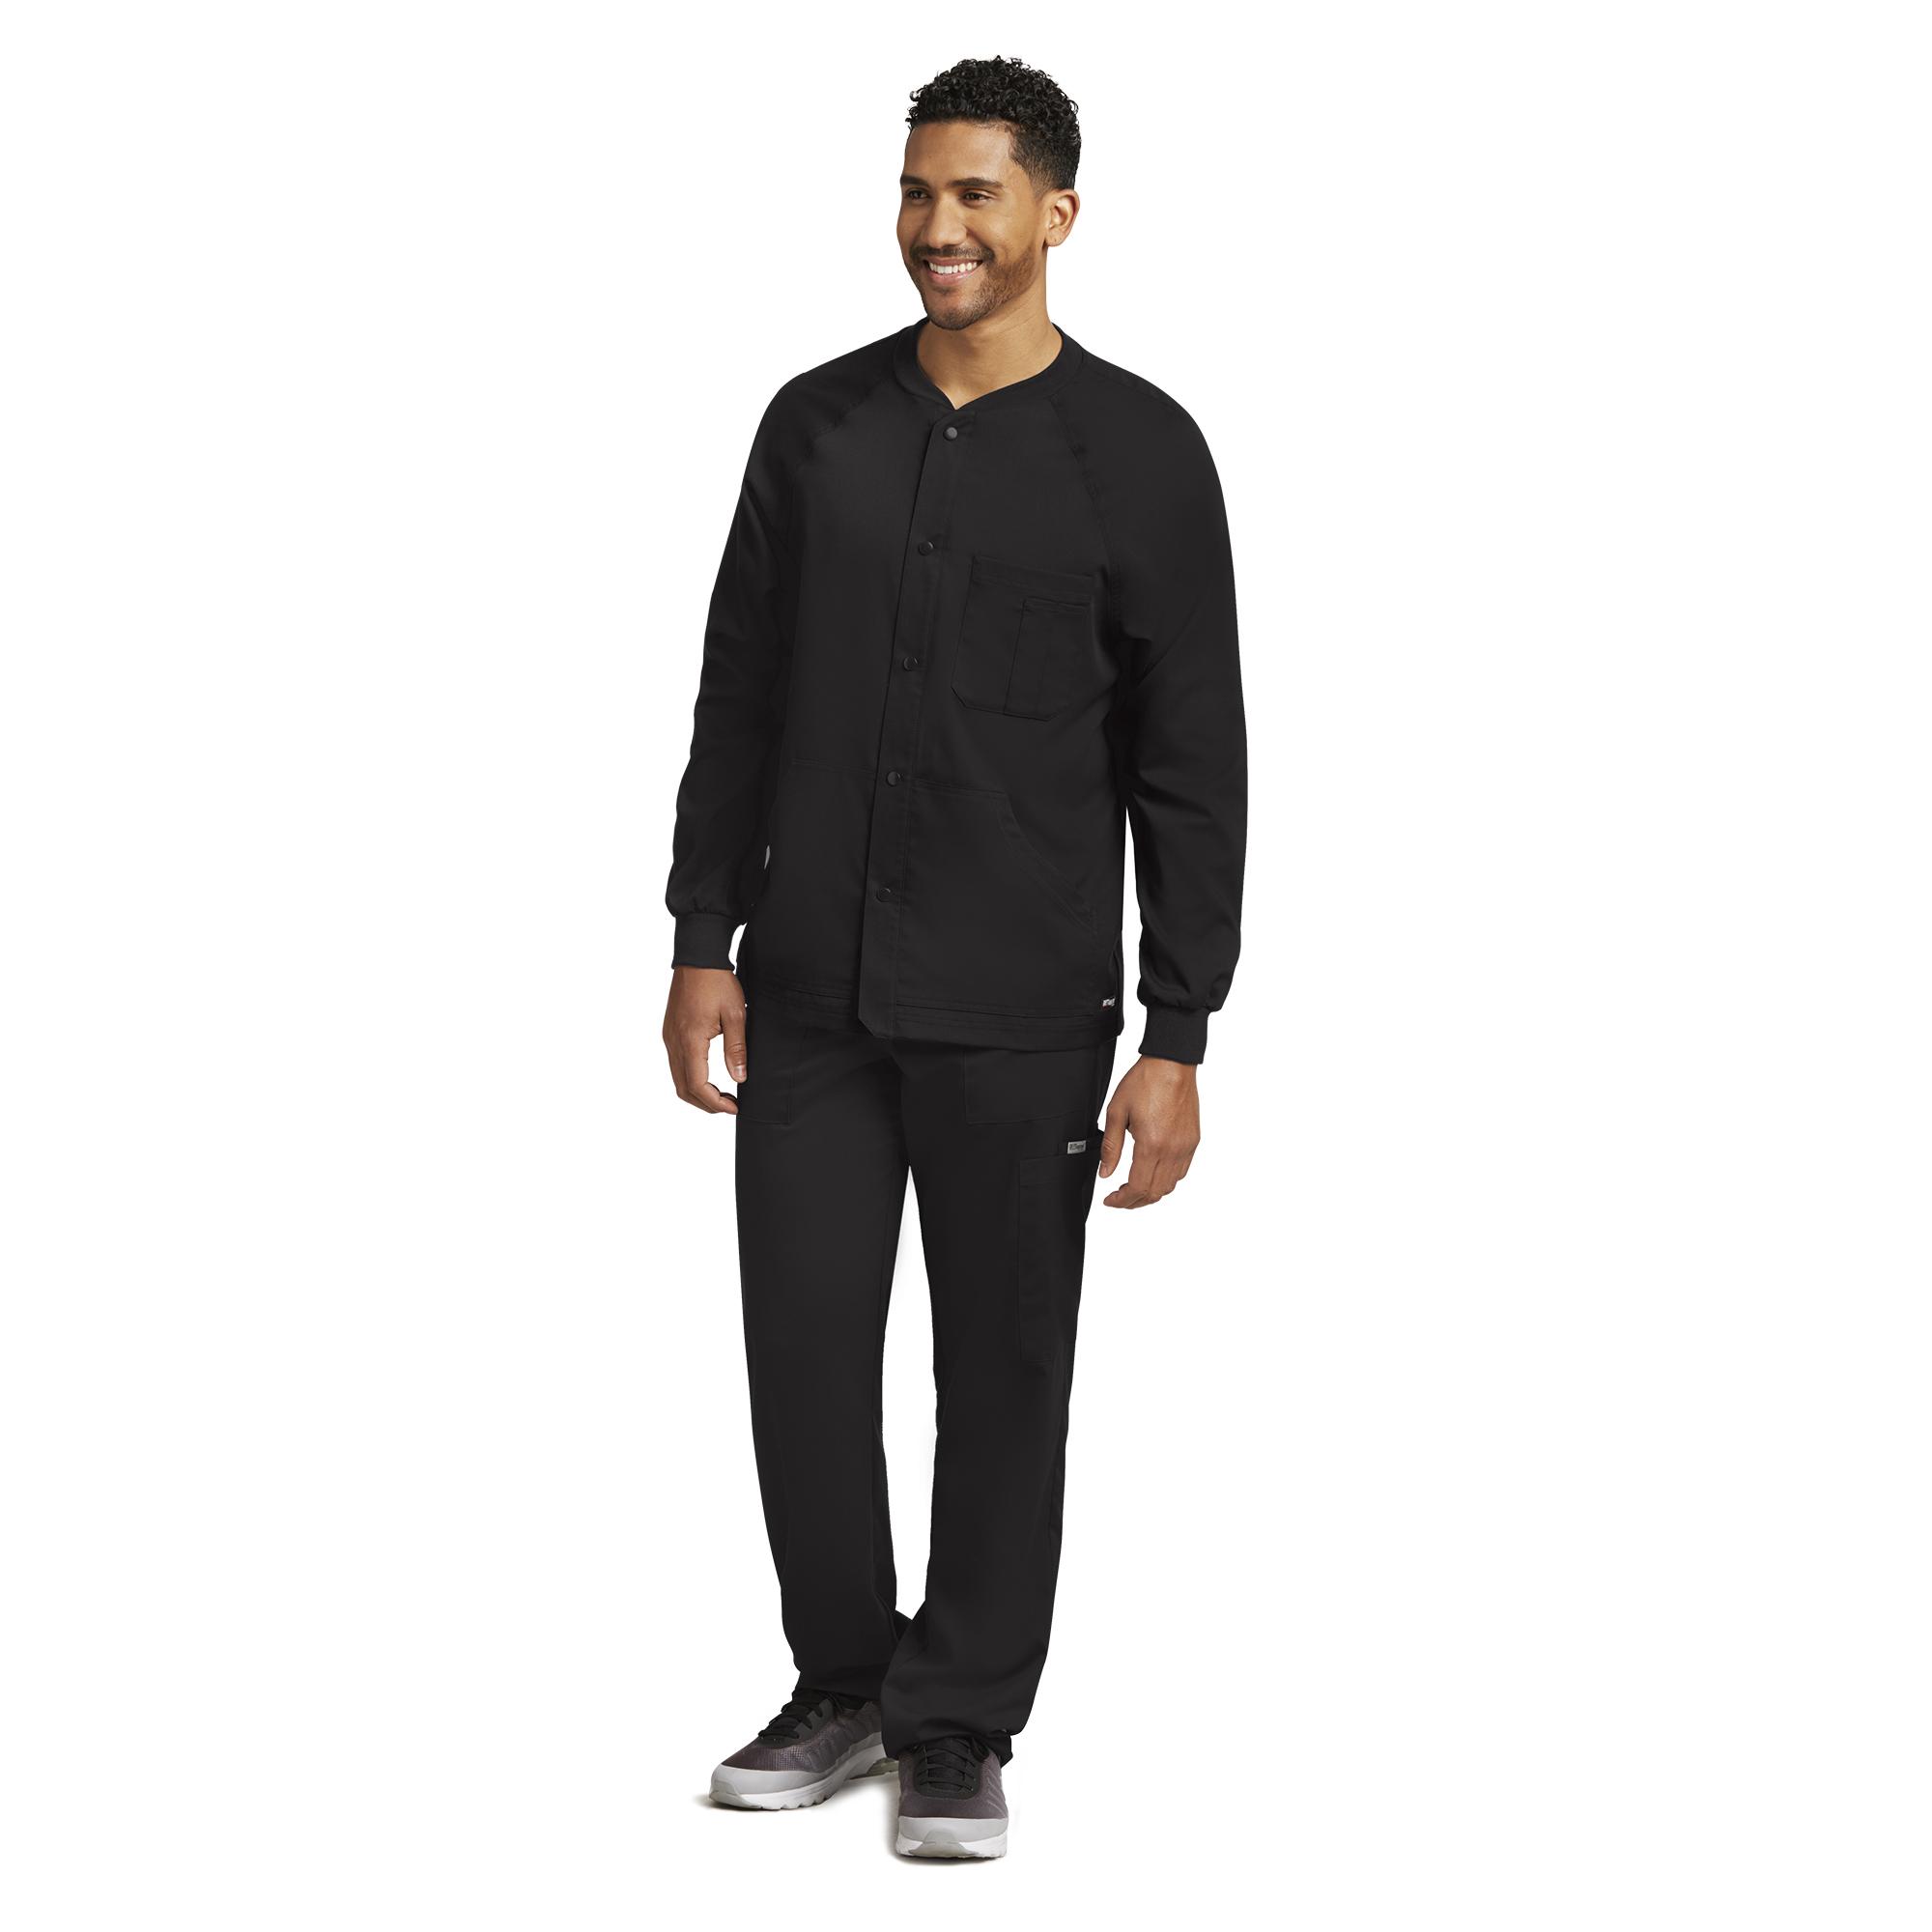 Grey\'s Anatomy Men\'s Five Pocket Raglan Warm-Up Scrub Jacket